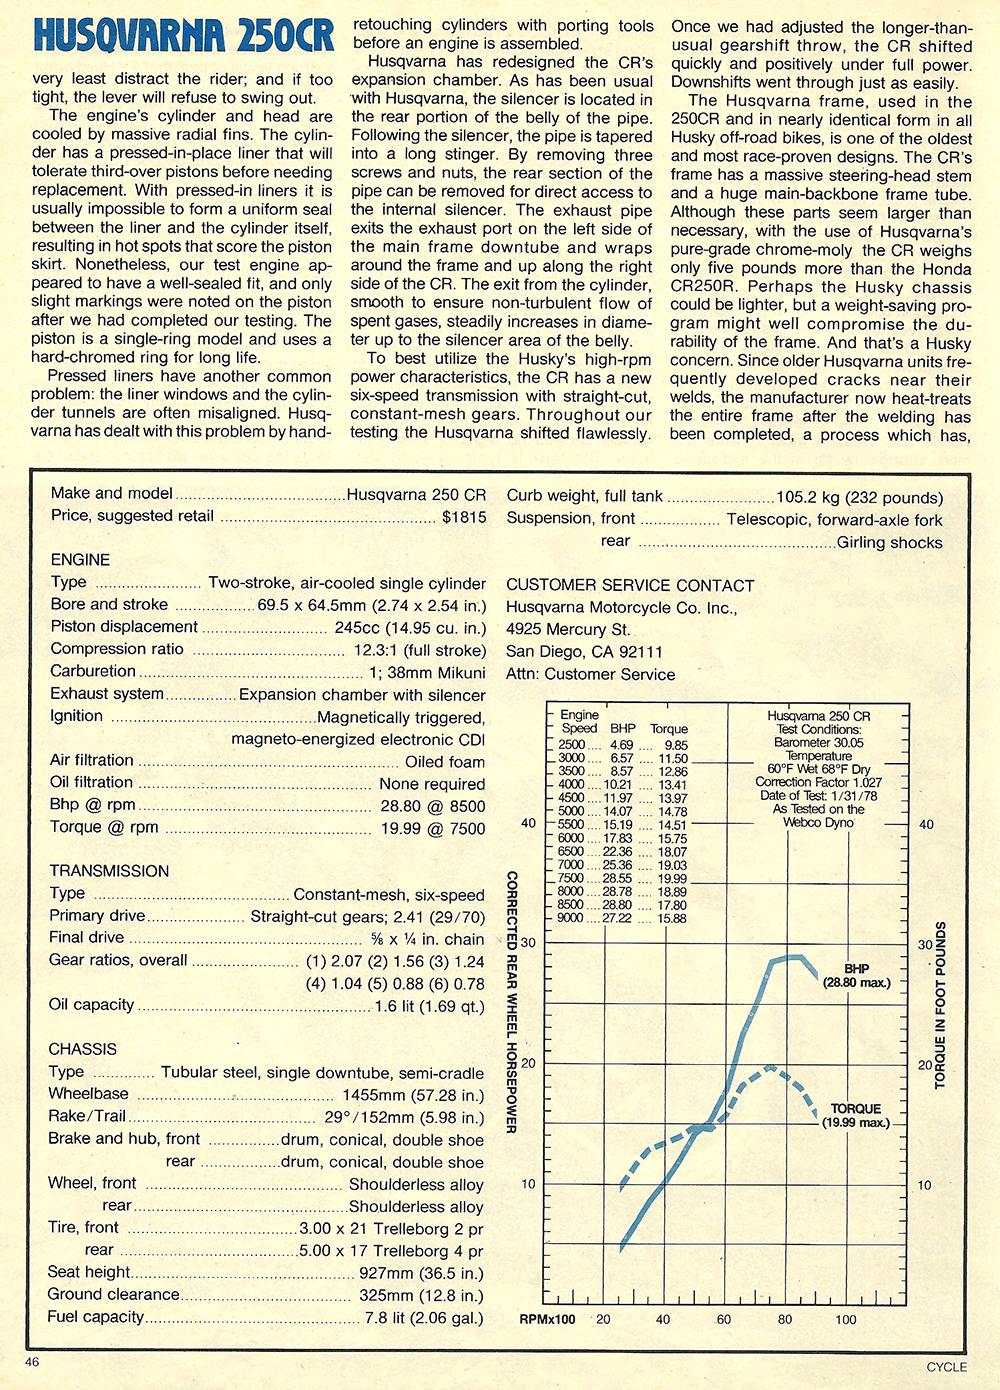 1978 Husqvarna 250 CR road test 4.jpg